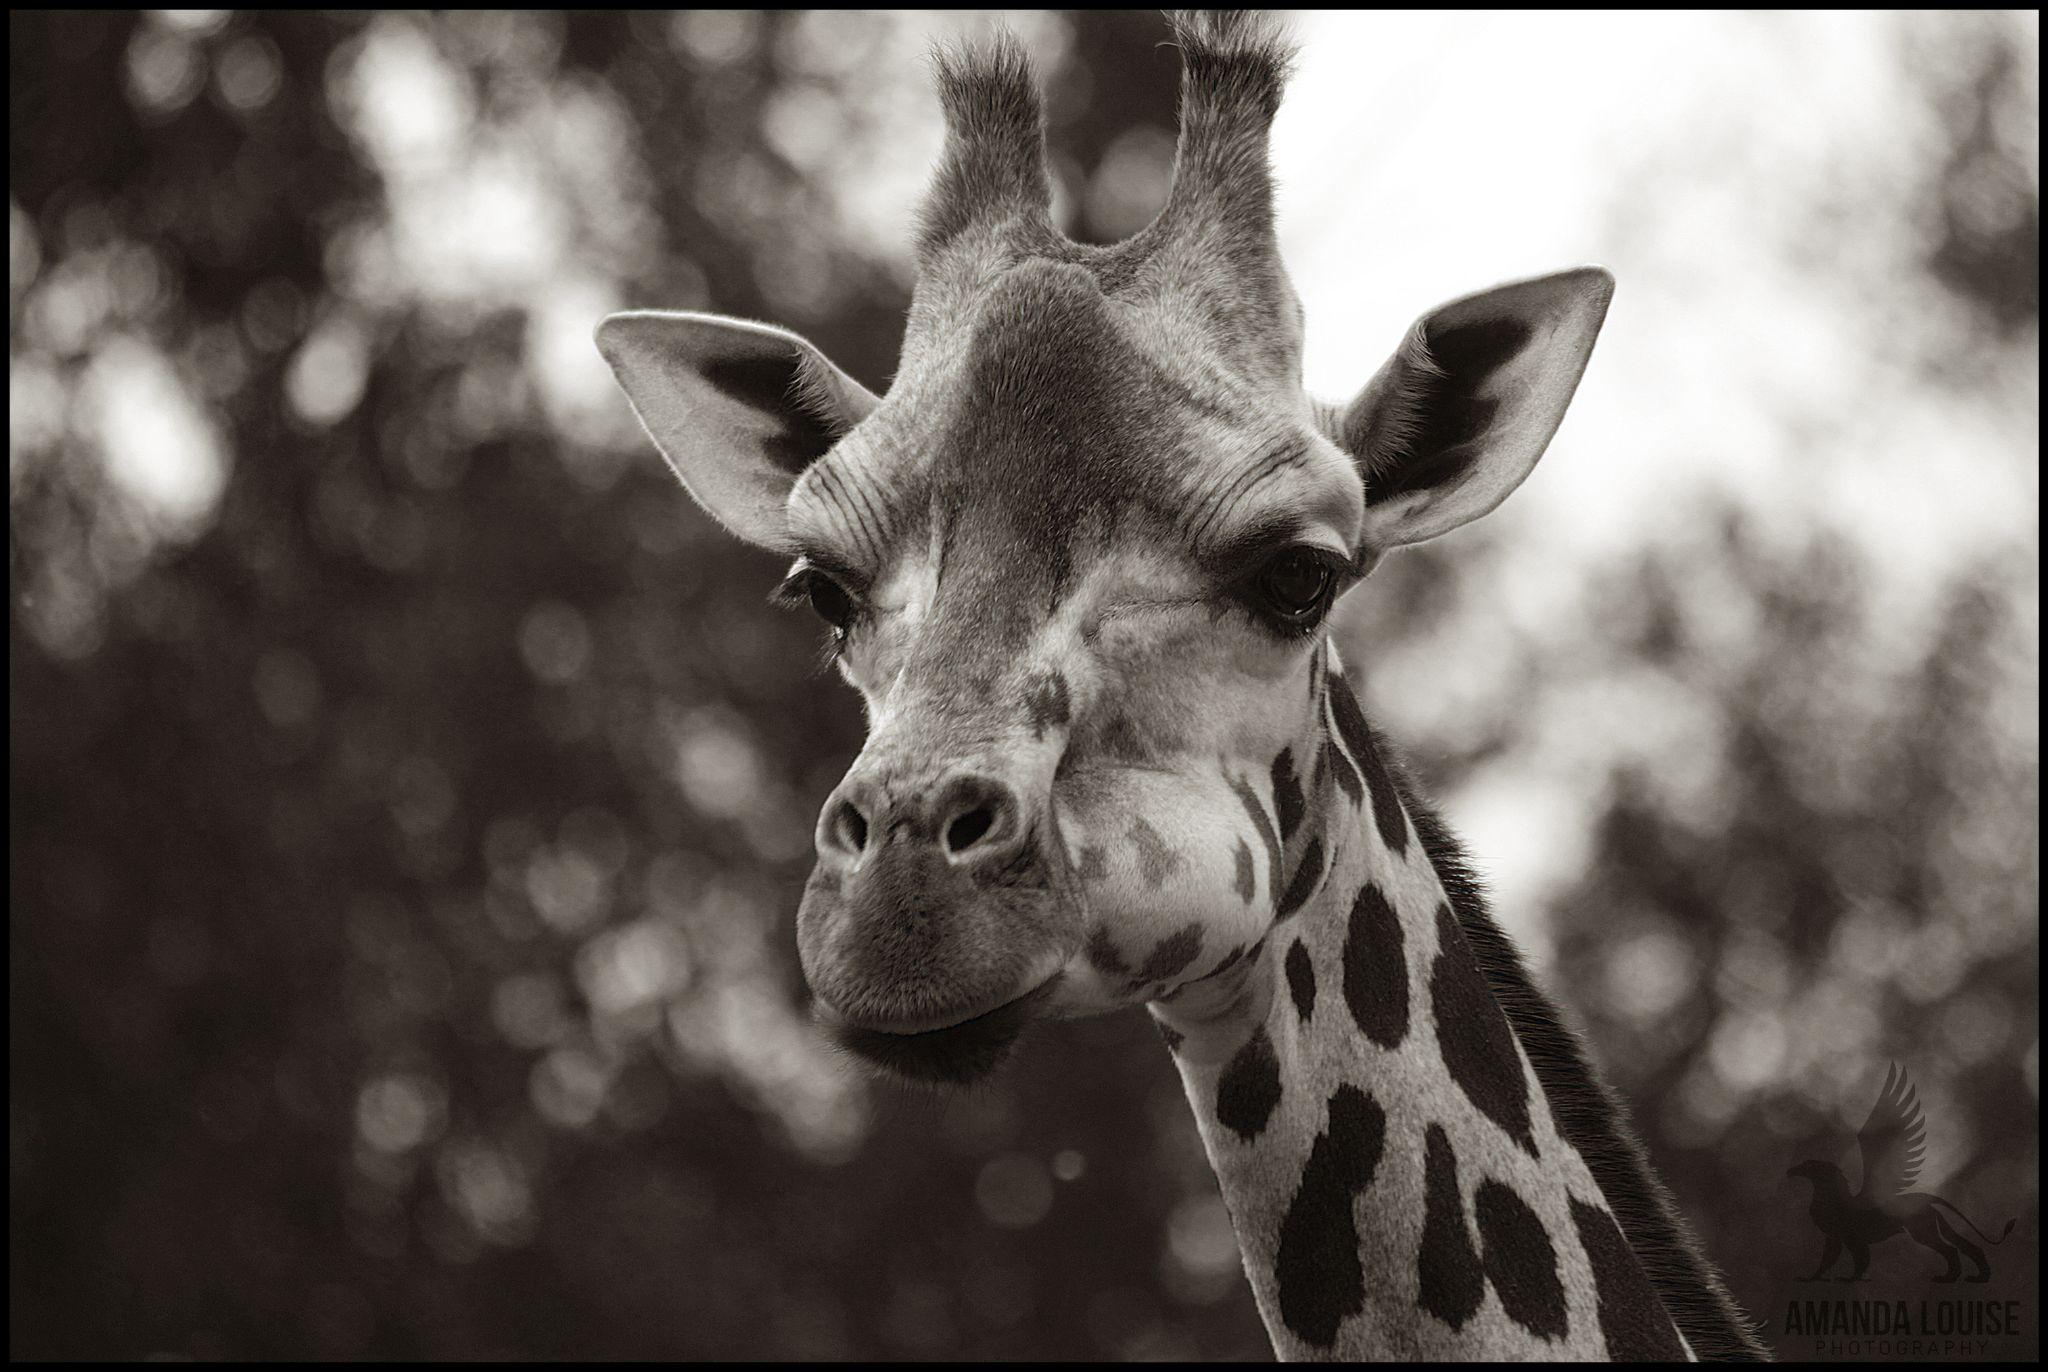 Giraffe by Amanda Louise Steele